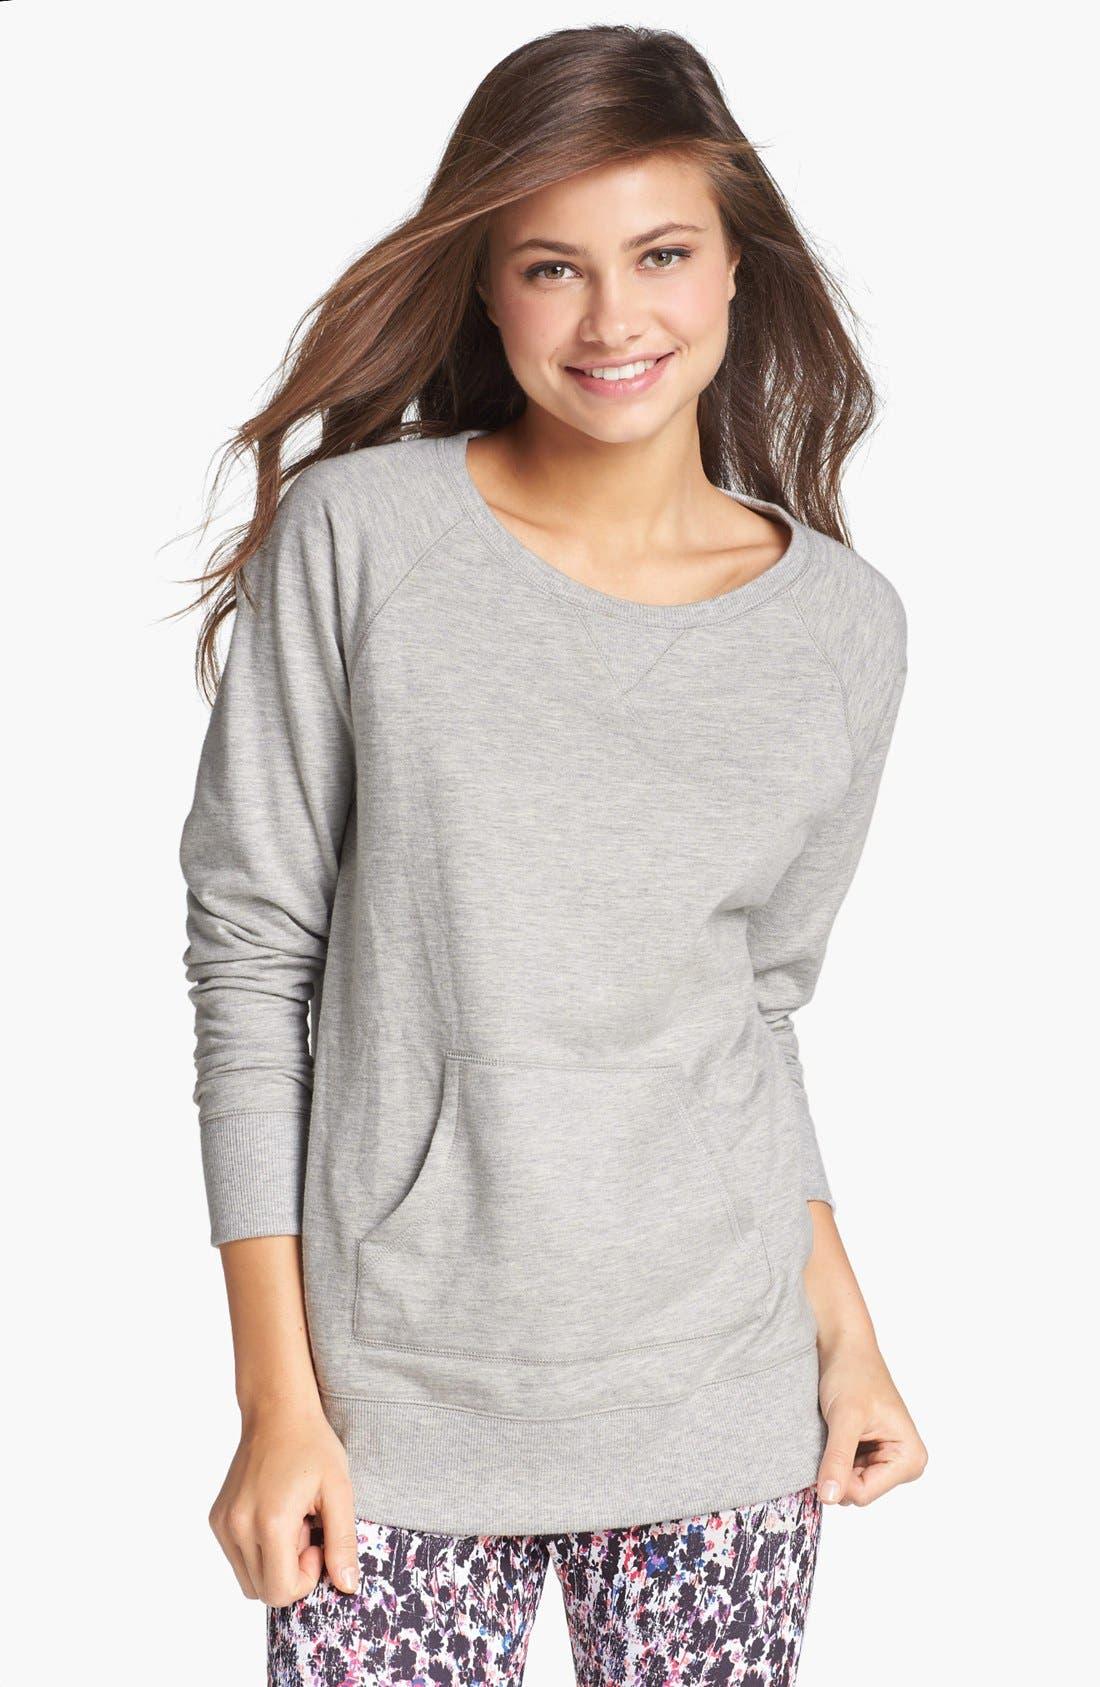 Alternate Image 1 Selected - BP. Undercover 'Snuggle Up' Sweatshirt (Juniors)